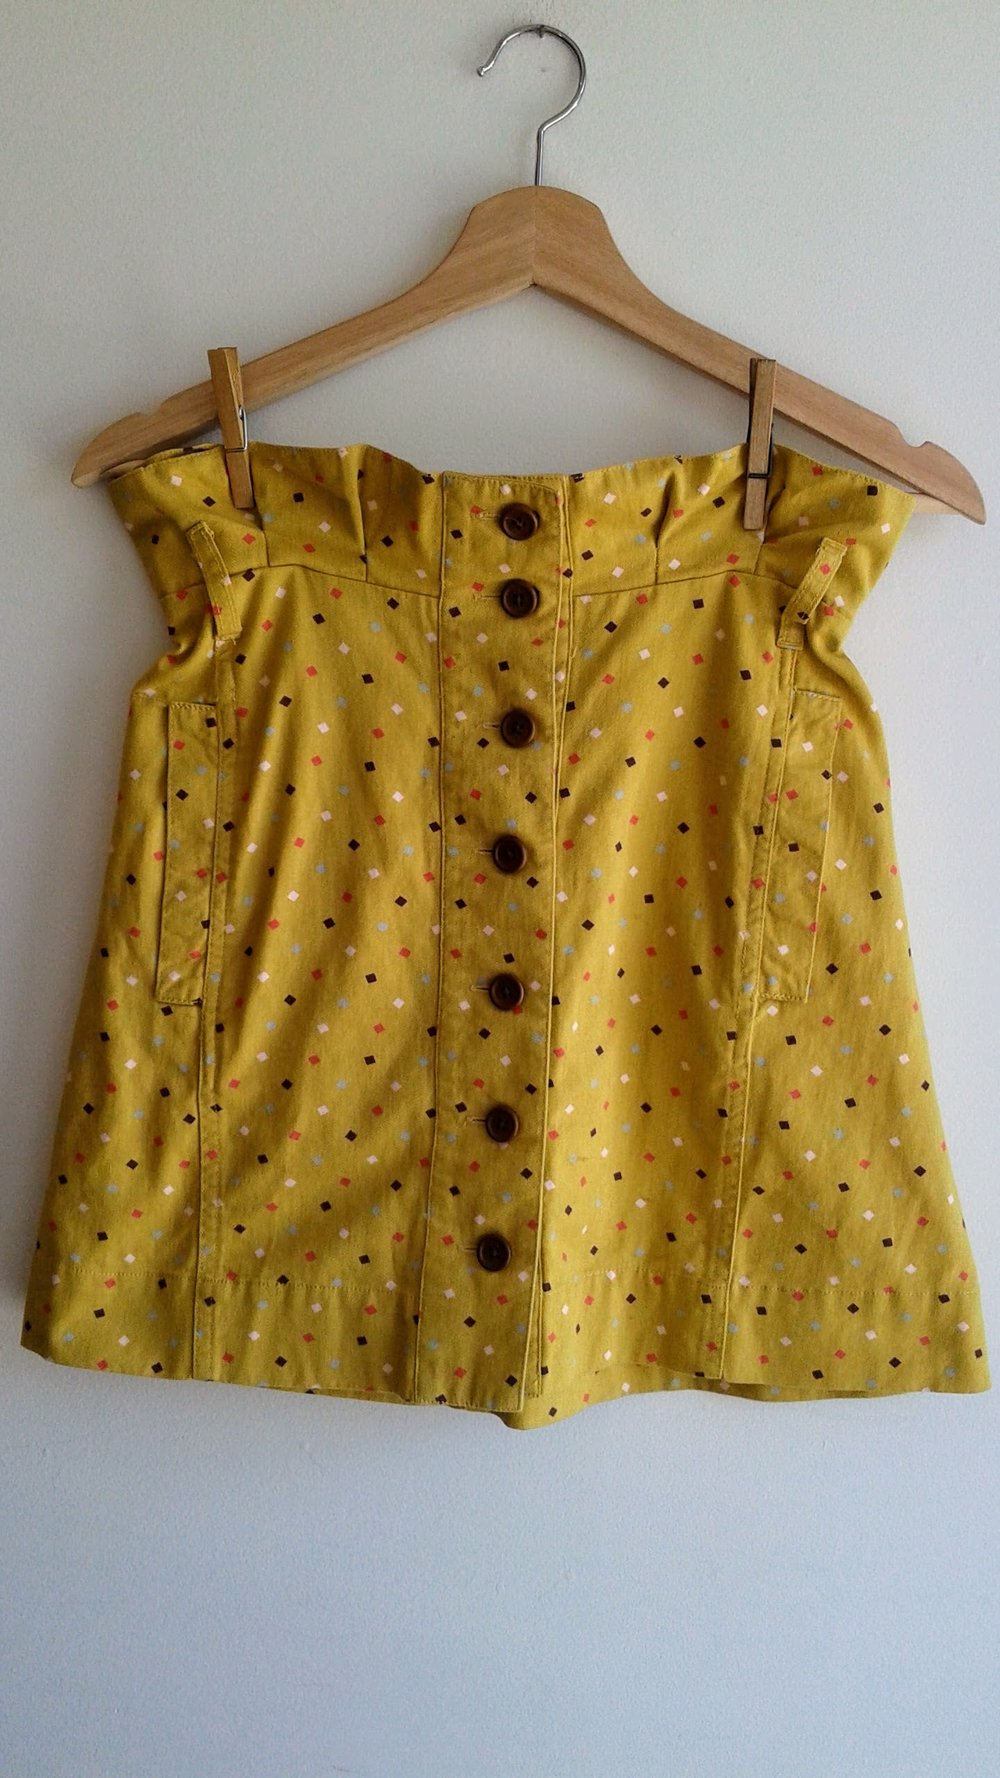 Silence & Noise skirt; Size M, $28